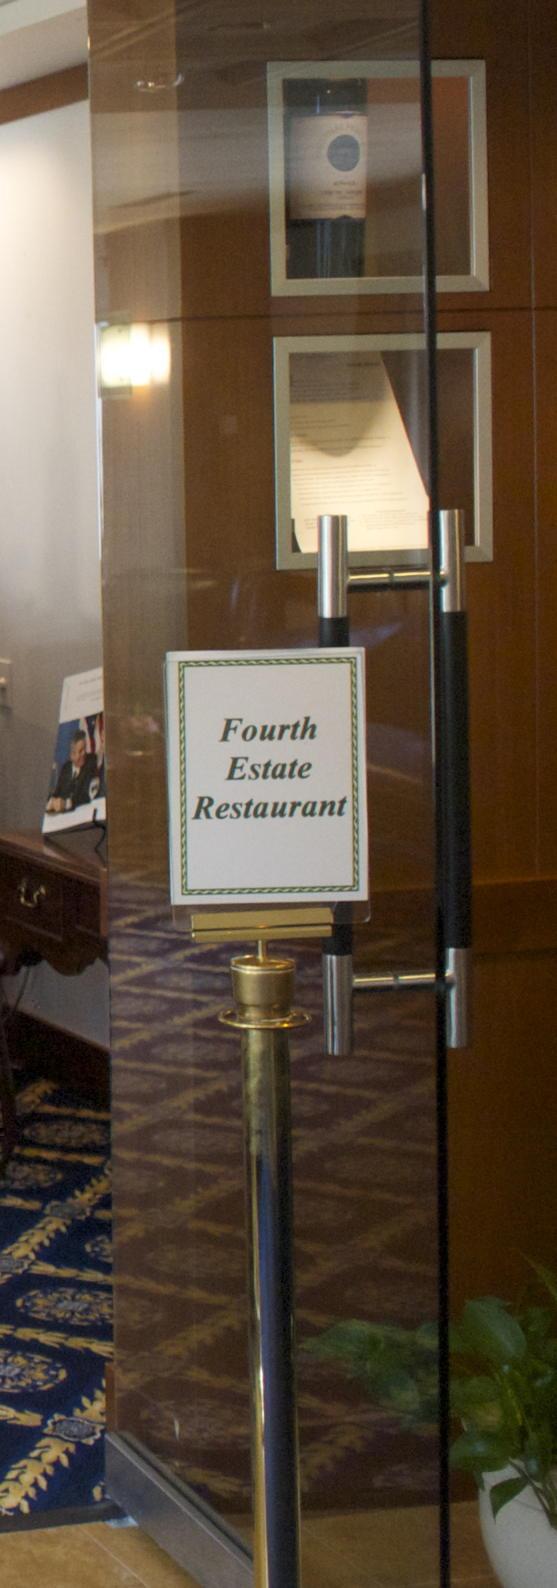 Fourth Estate Restaurant